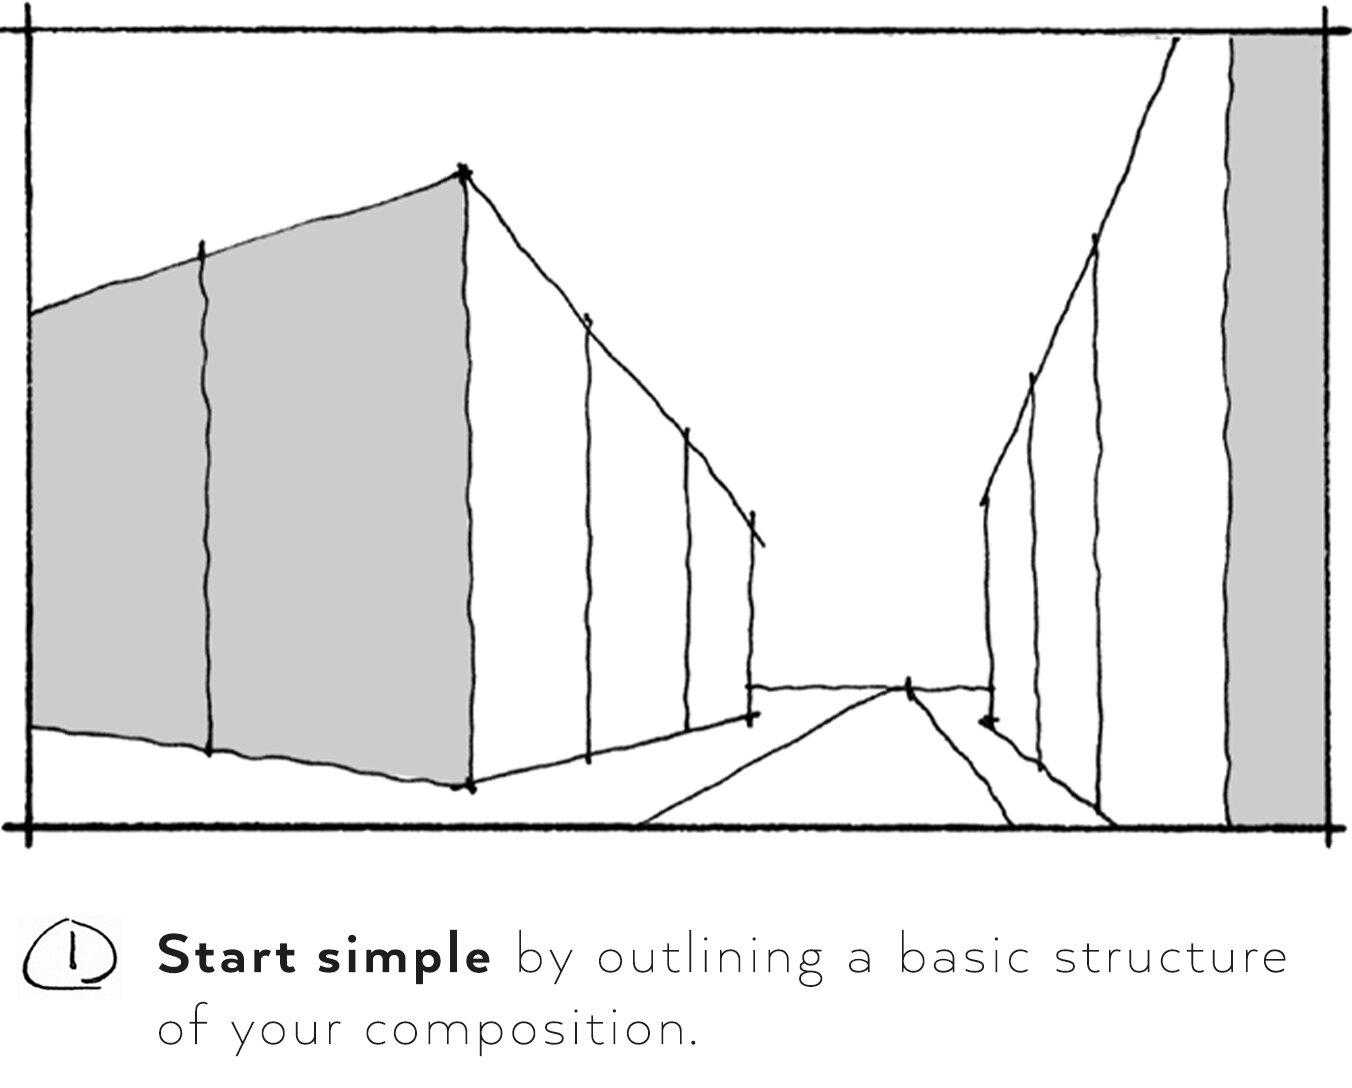 01_Start_Simple.jpg